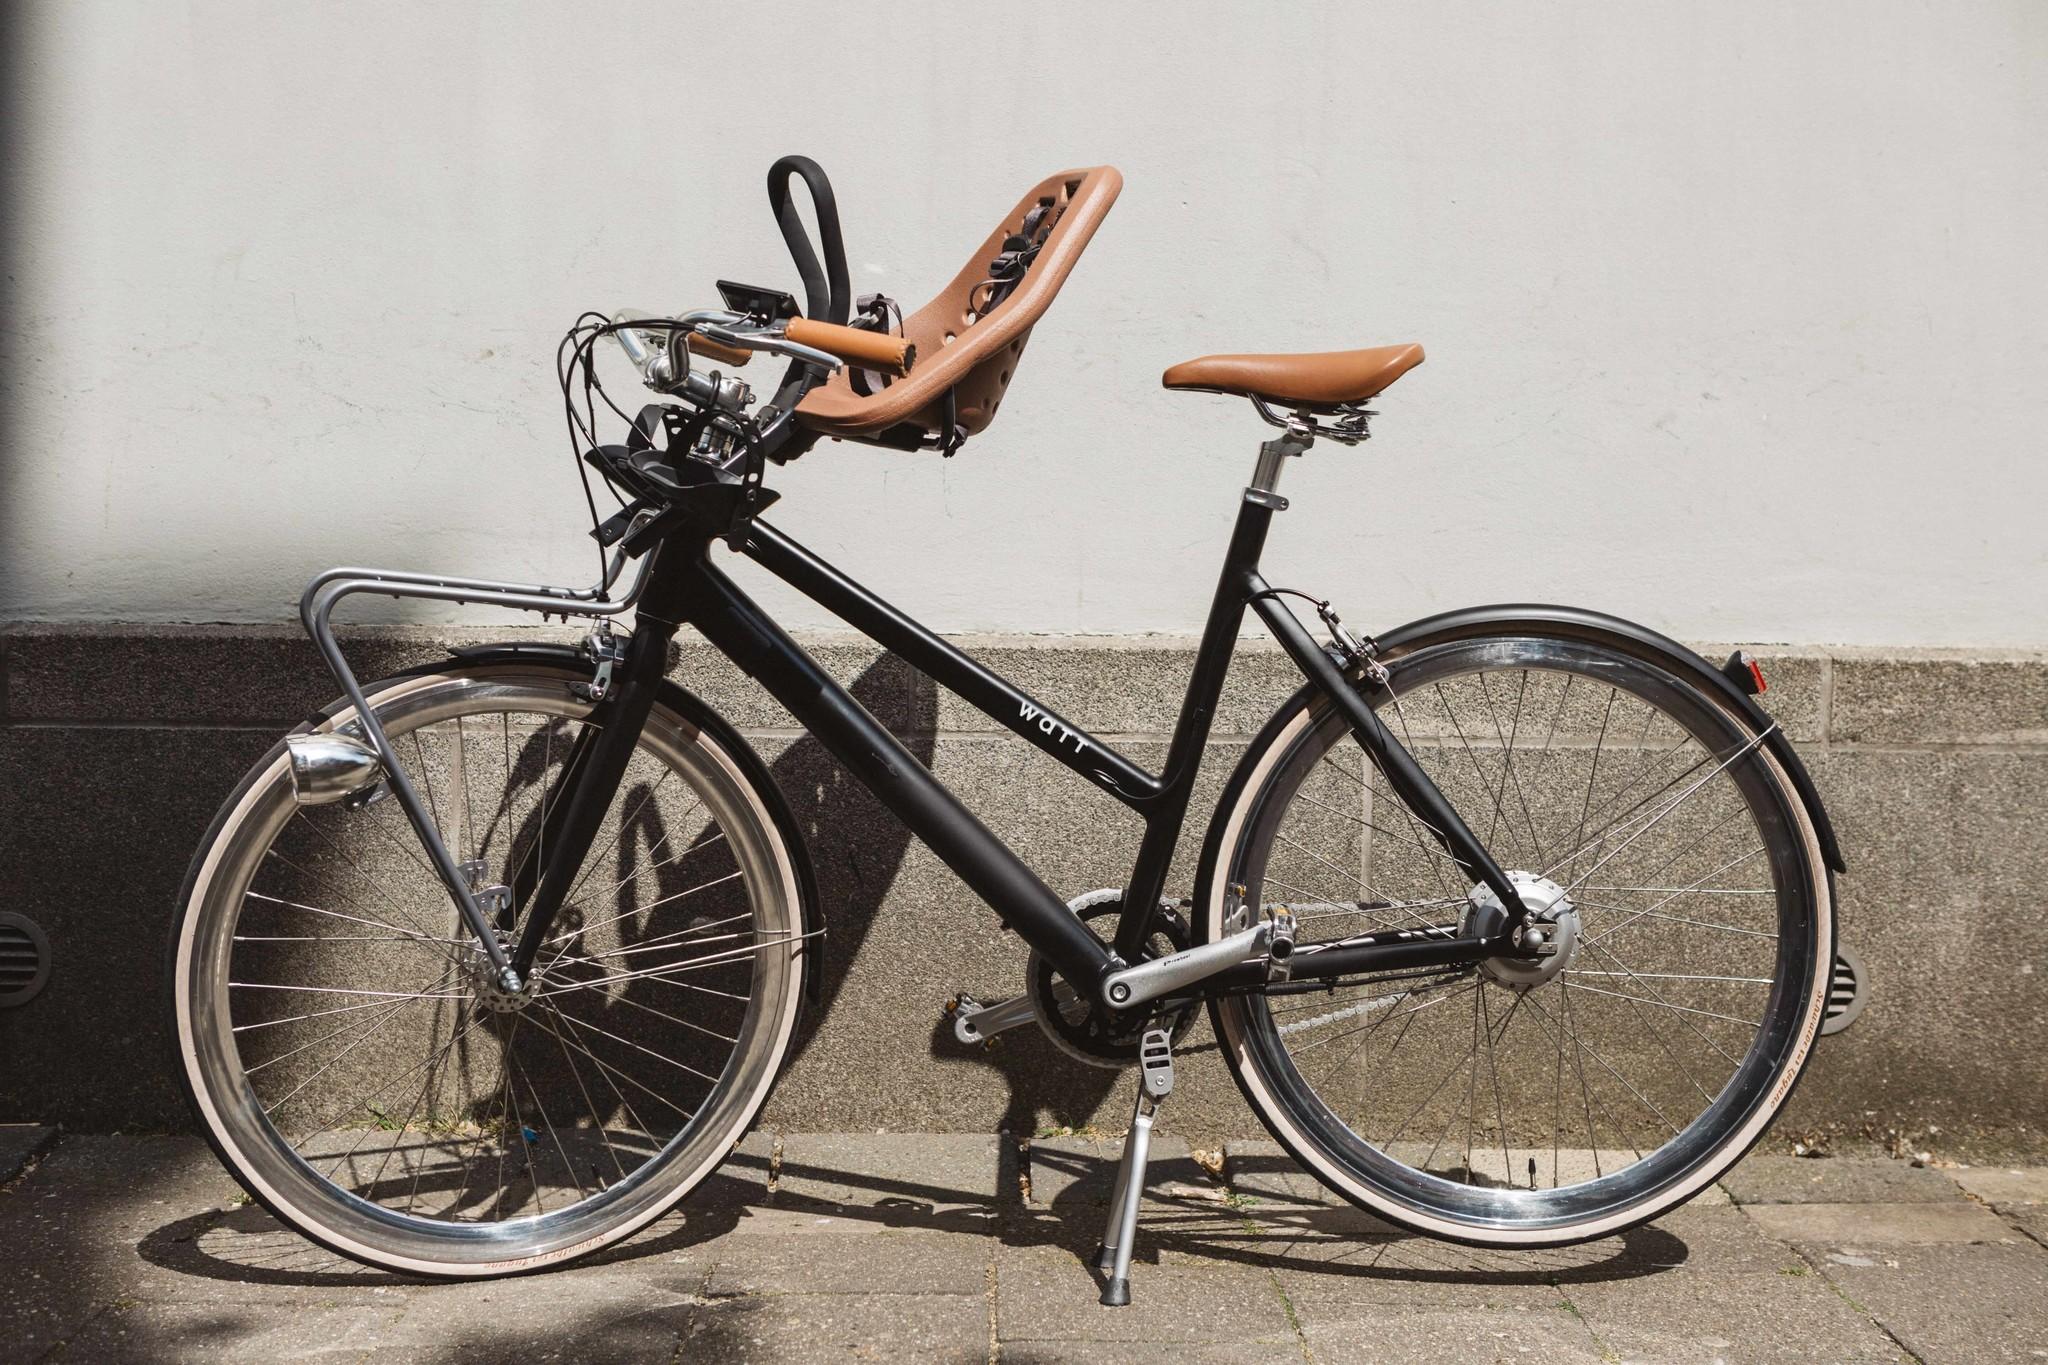 Goede WATT Fietsen: bestel je elektrische dames fiets online - WATT Fietsen FN-05